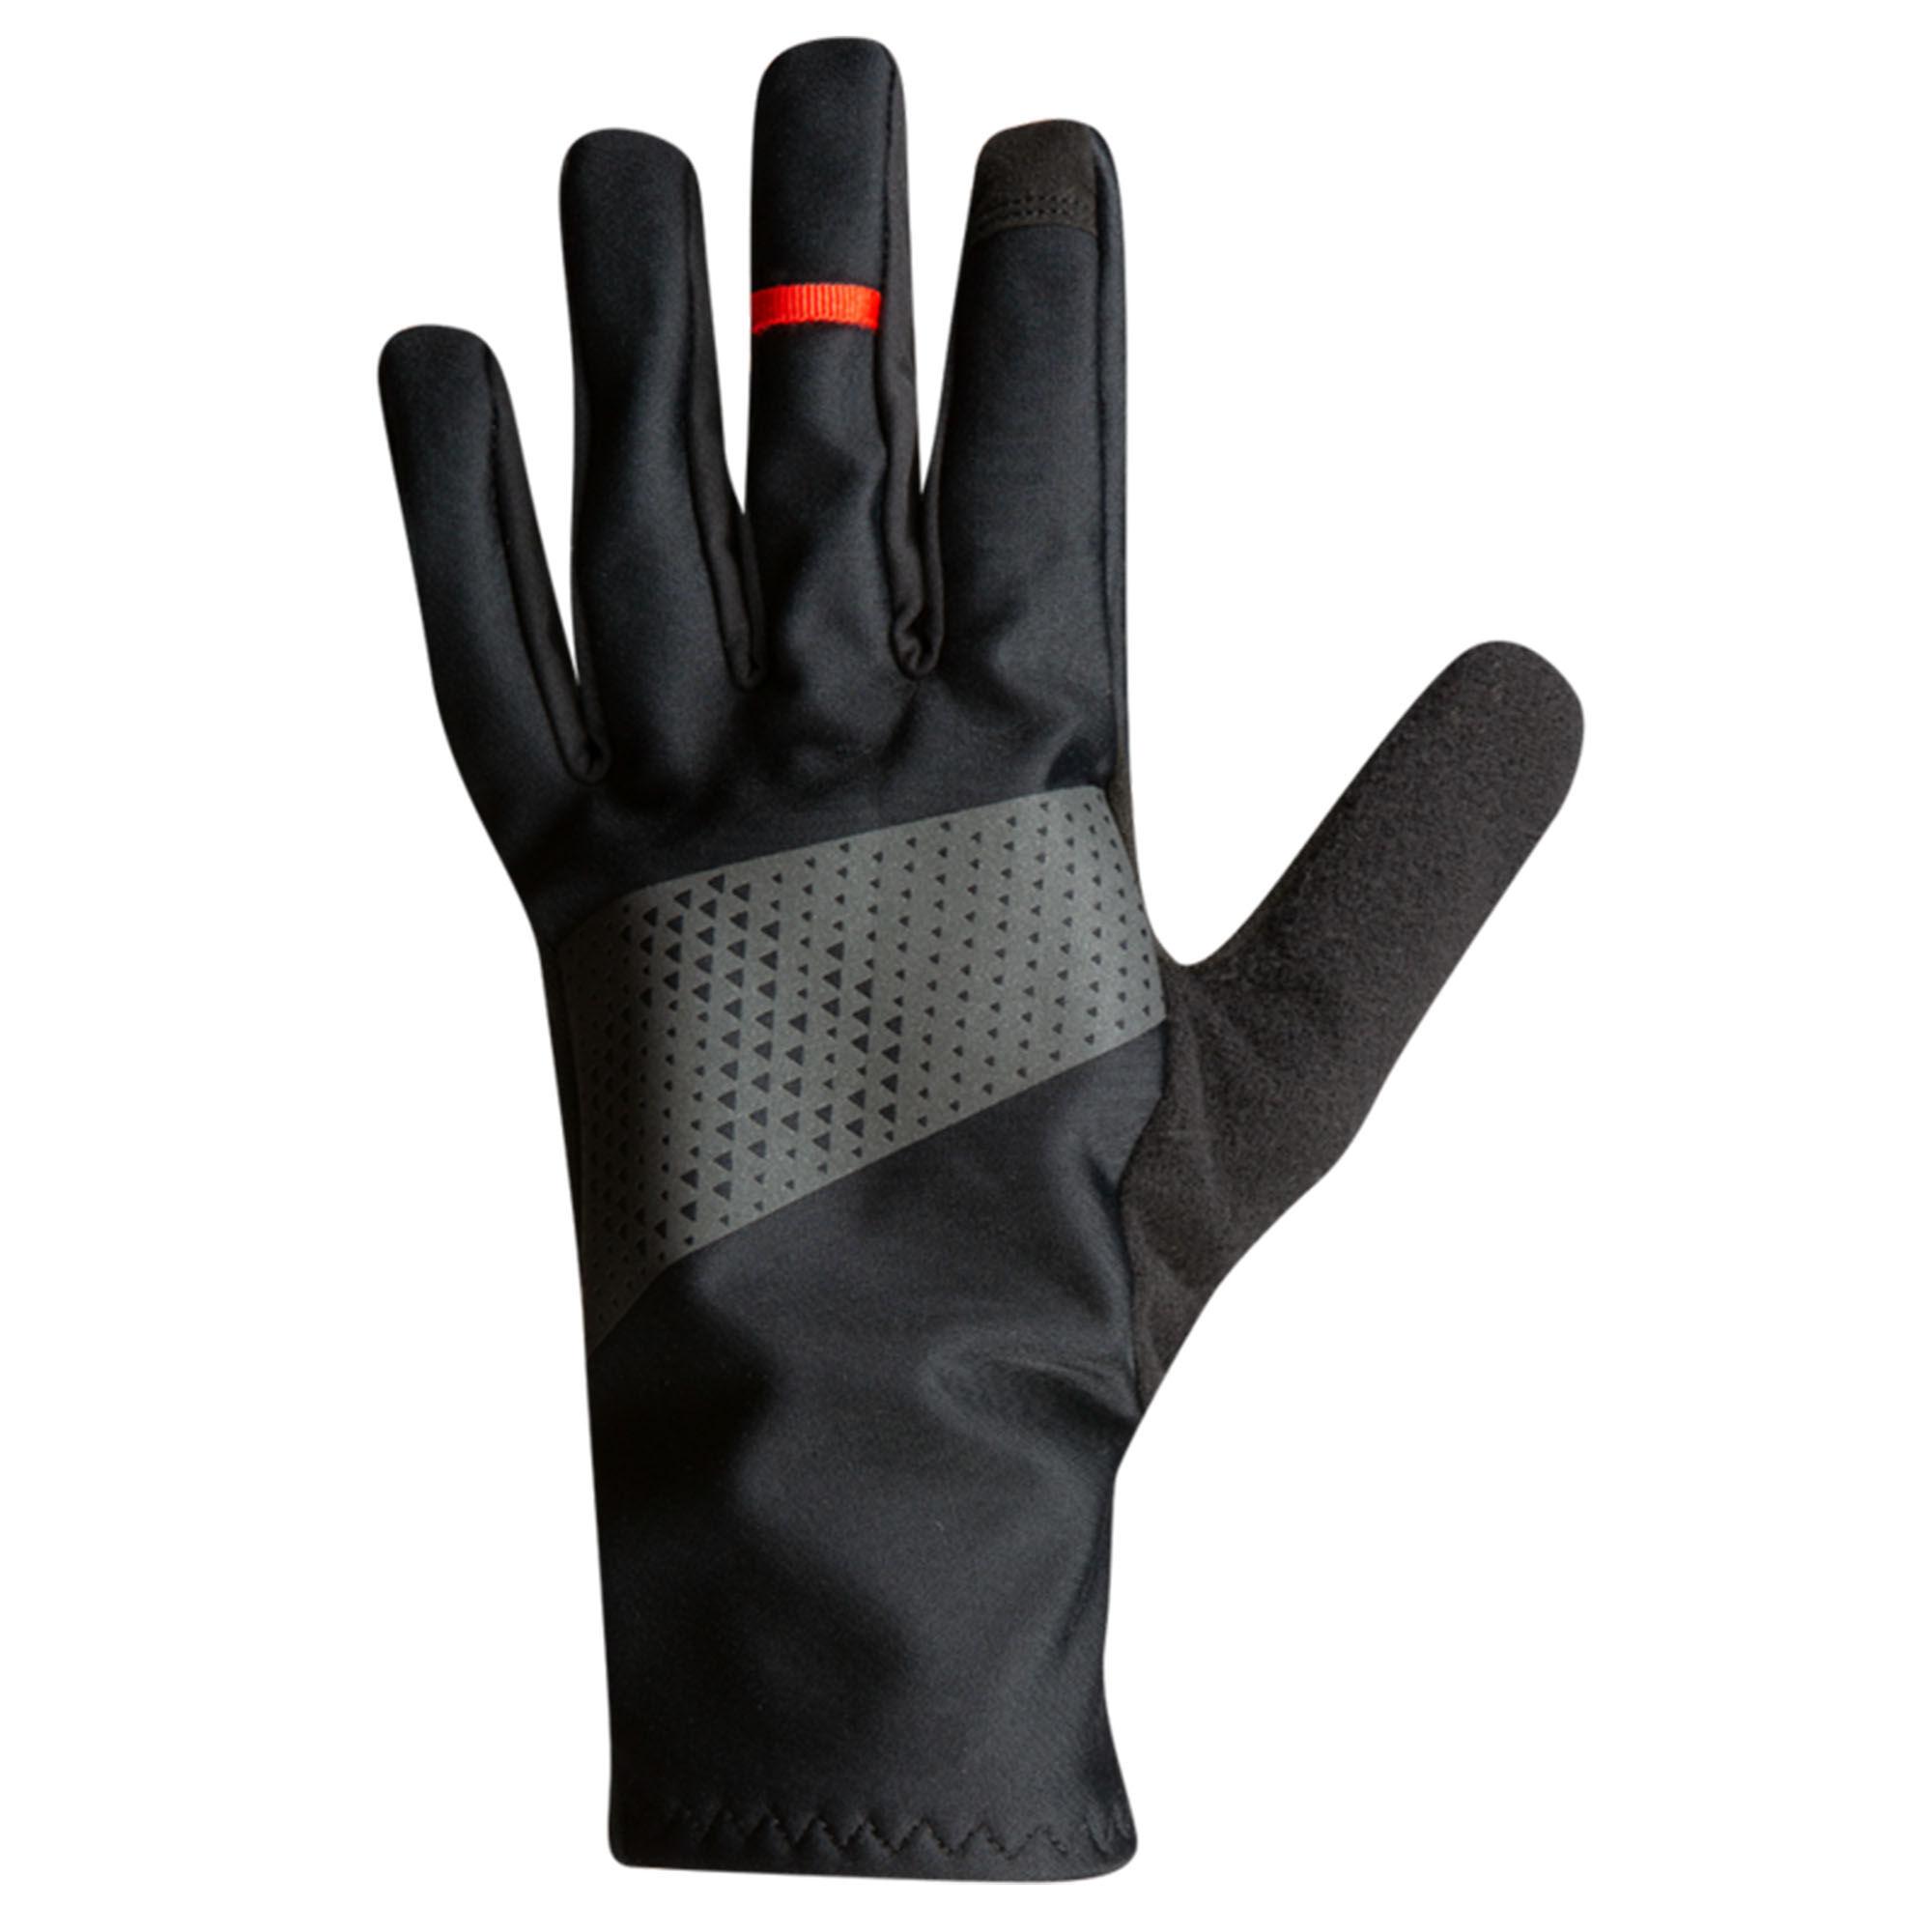 Pearl Izumi Men's Cyclone Gel Bike Gloves  - Black - Size: 2X-Large